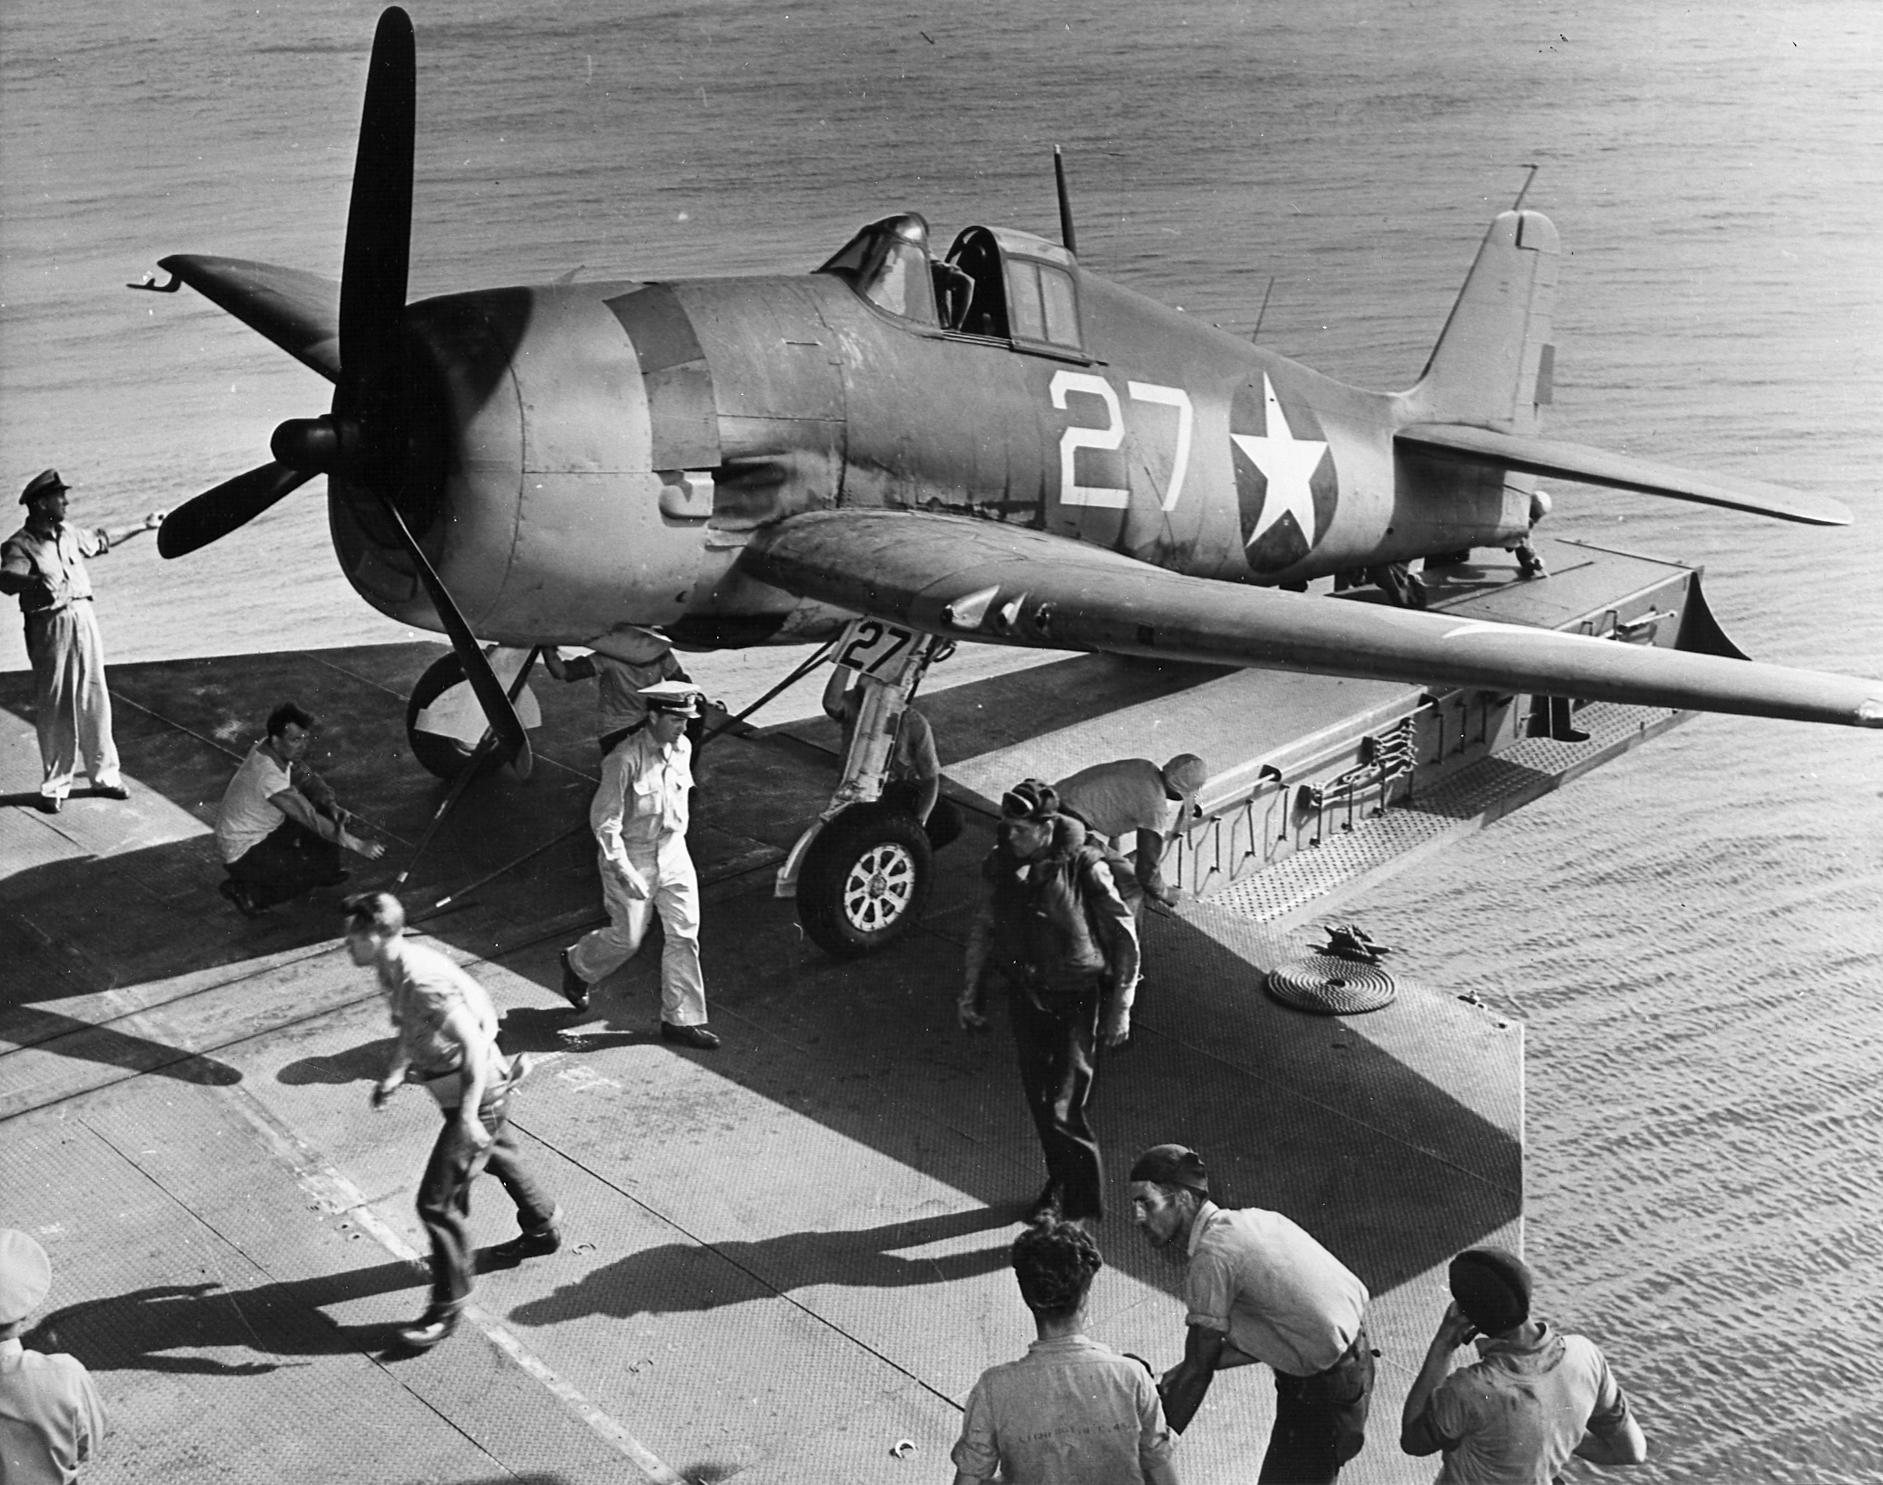 Grumman F6F 3 Hellcat VF 1 White 27 using the hangar deck catapault CV 10 USS Yorktown Jun 1943 02